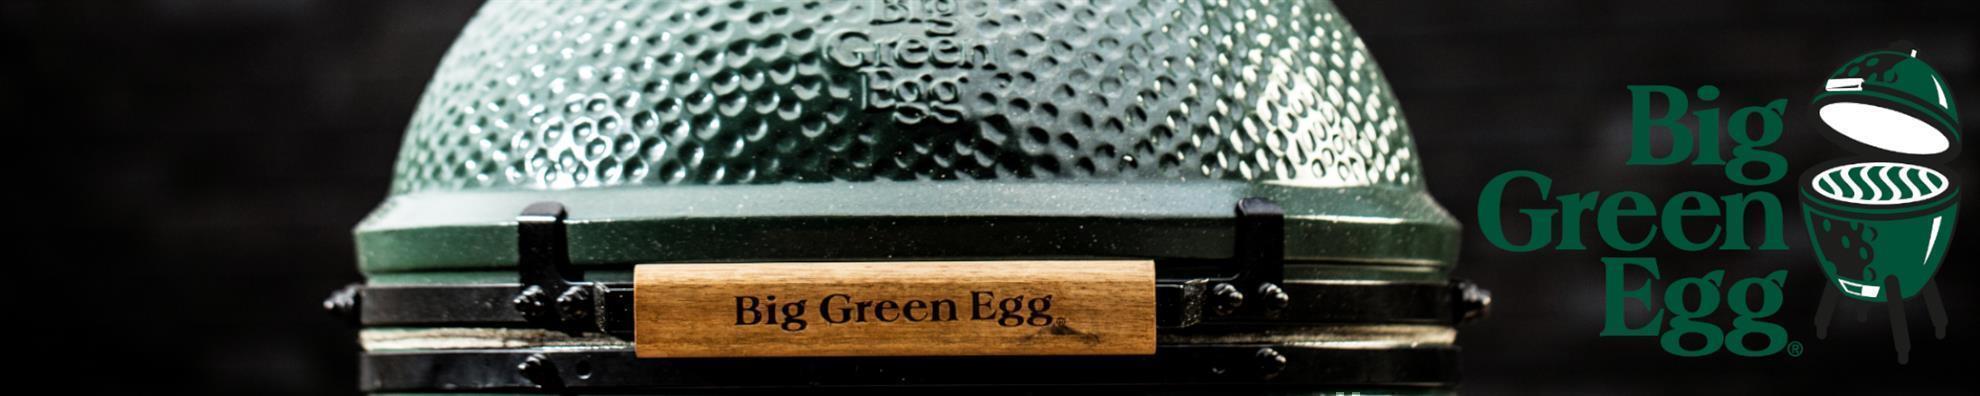 Big Green Egg - ConvEGGtor Large